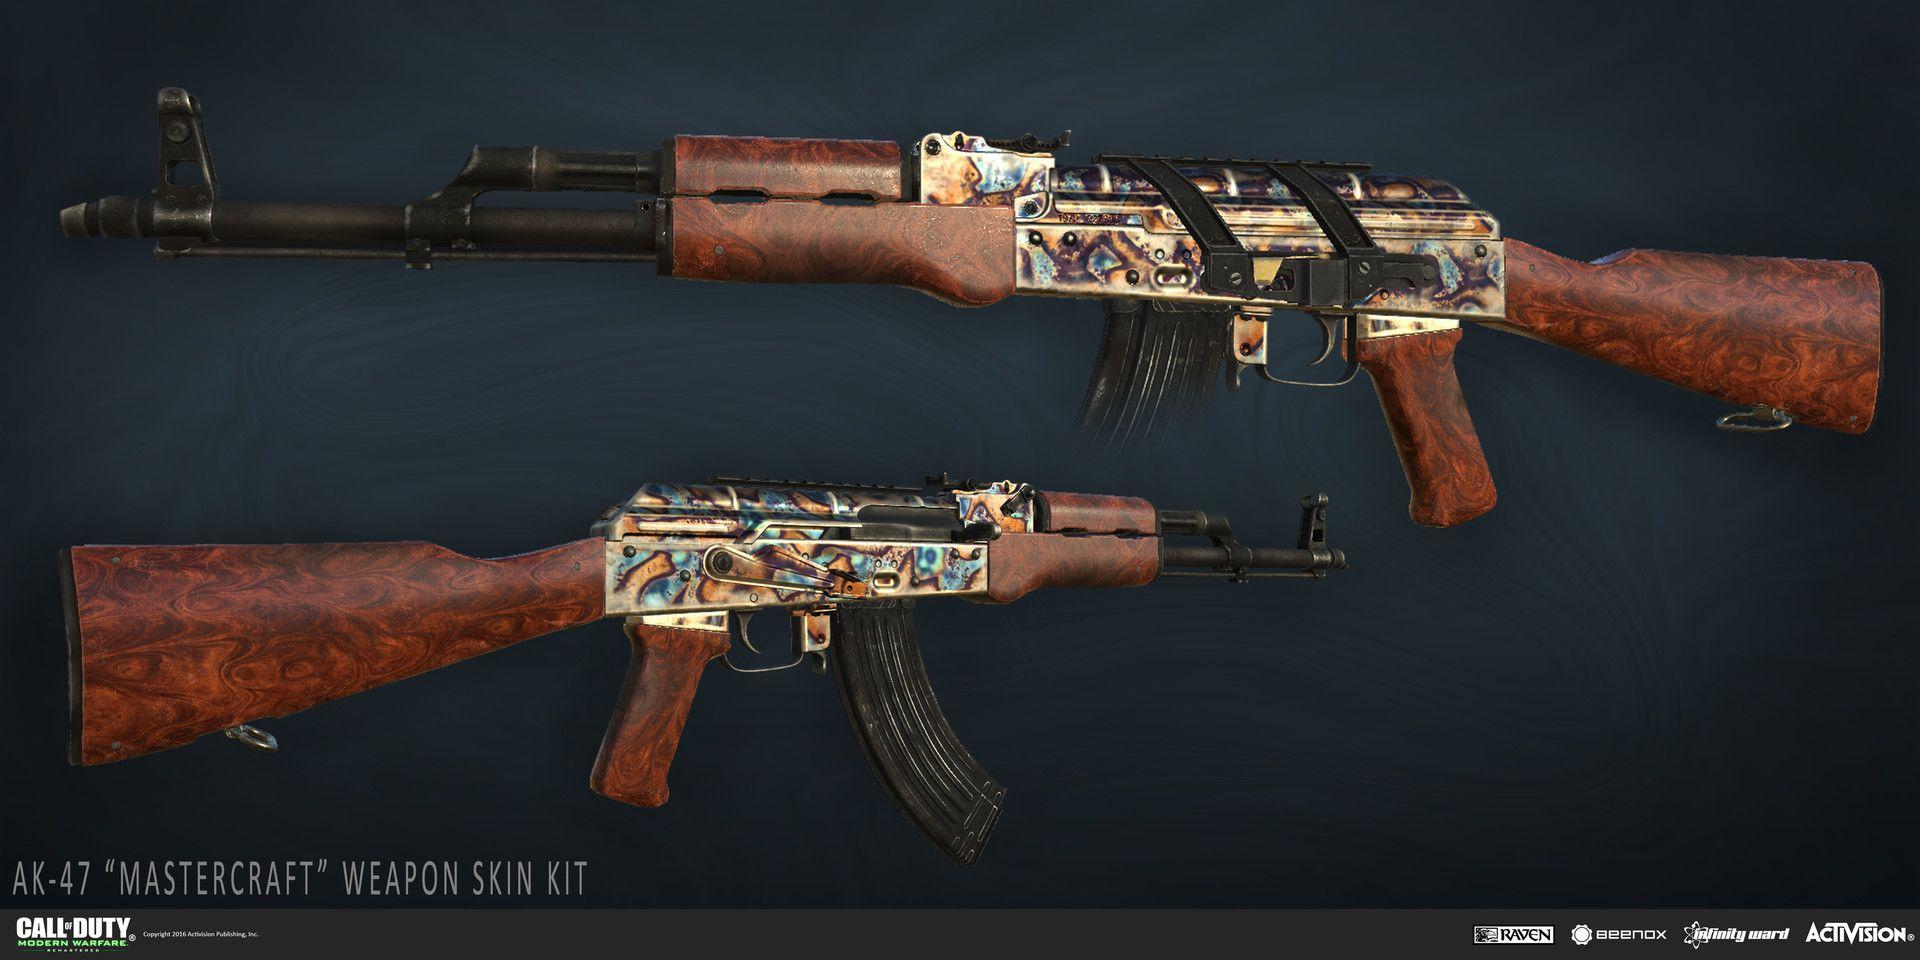 Pin On Weapons Backyard bbq modern warfare